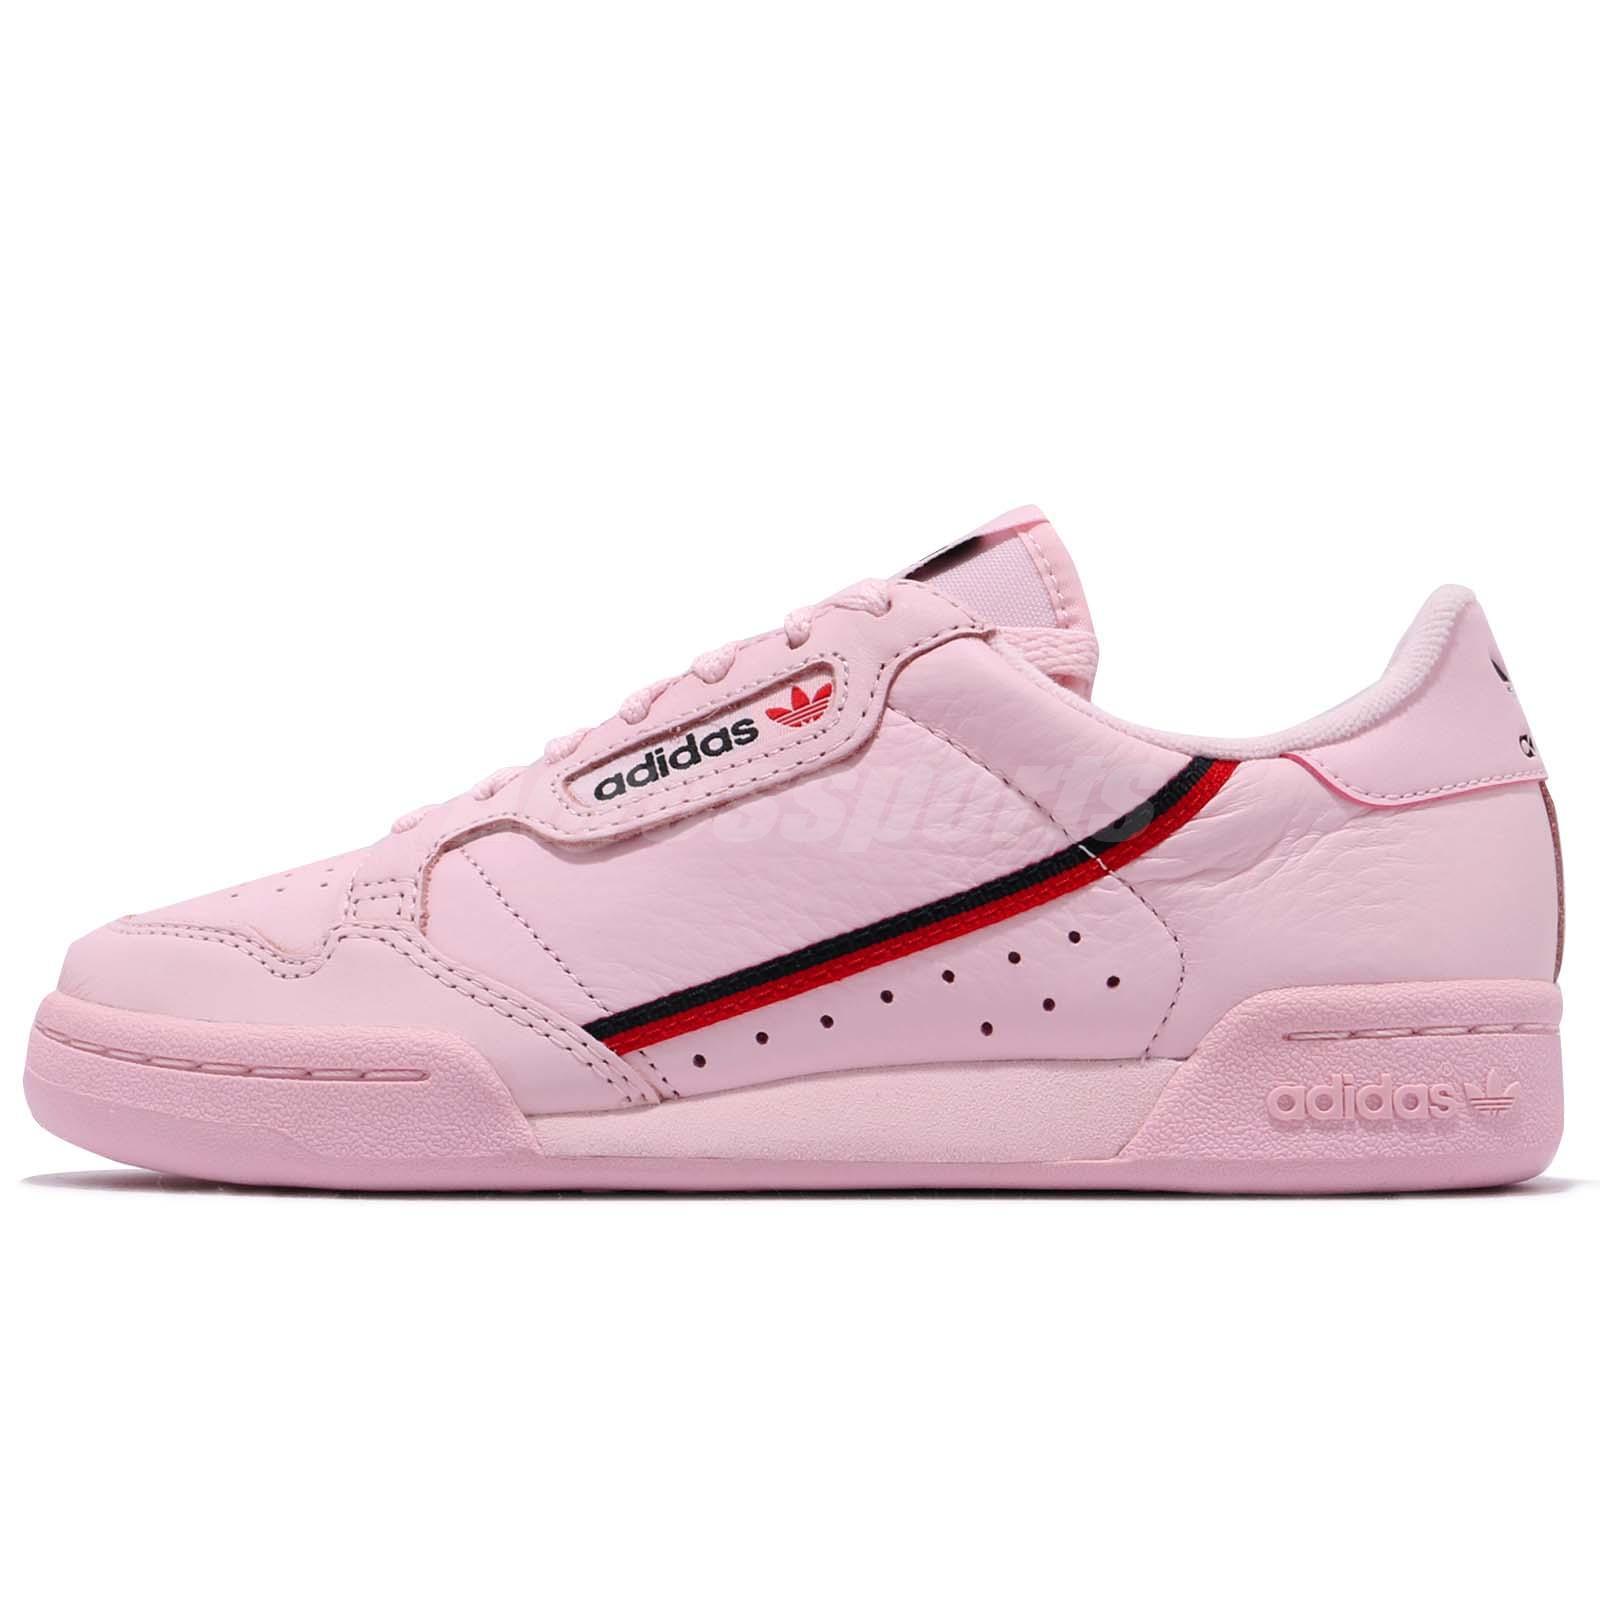 half off 7210d 7b29f adidas Originals Continental 80 Pink Scarlet Navy Men Women Casual Shoes  B41679